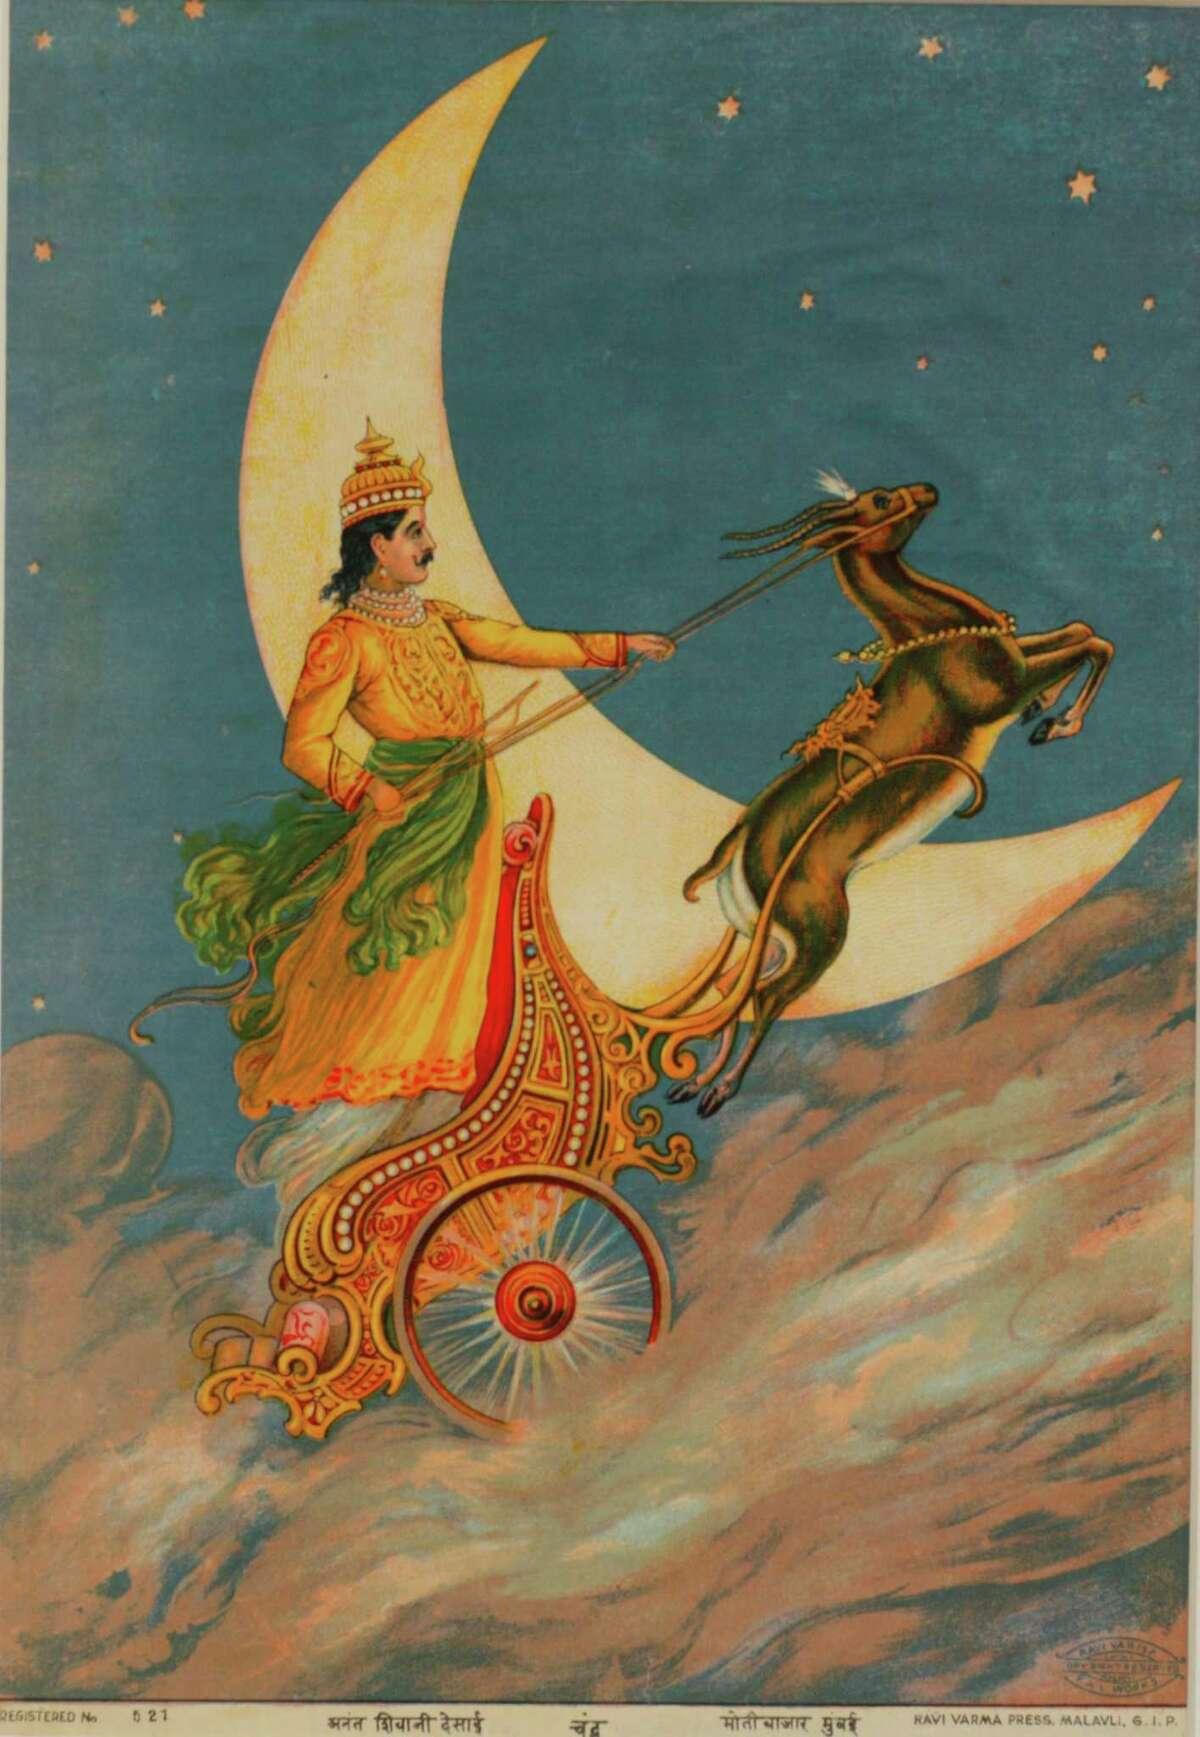 "On view in ""Transcendent Deities of India"" at Asia Society Texas Center through Sept. 14: Chandra, c. 1925; Paper, ink; Ravi Varma Press, Malavli, G.I.P.; Courtesy of the Ramchander Nath Foundation, New Delhi."